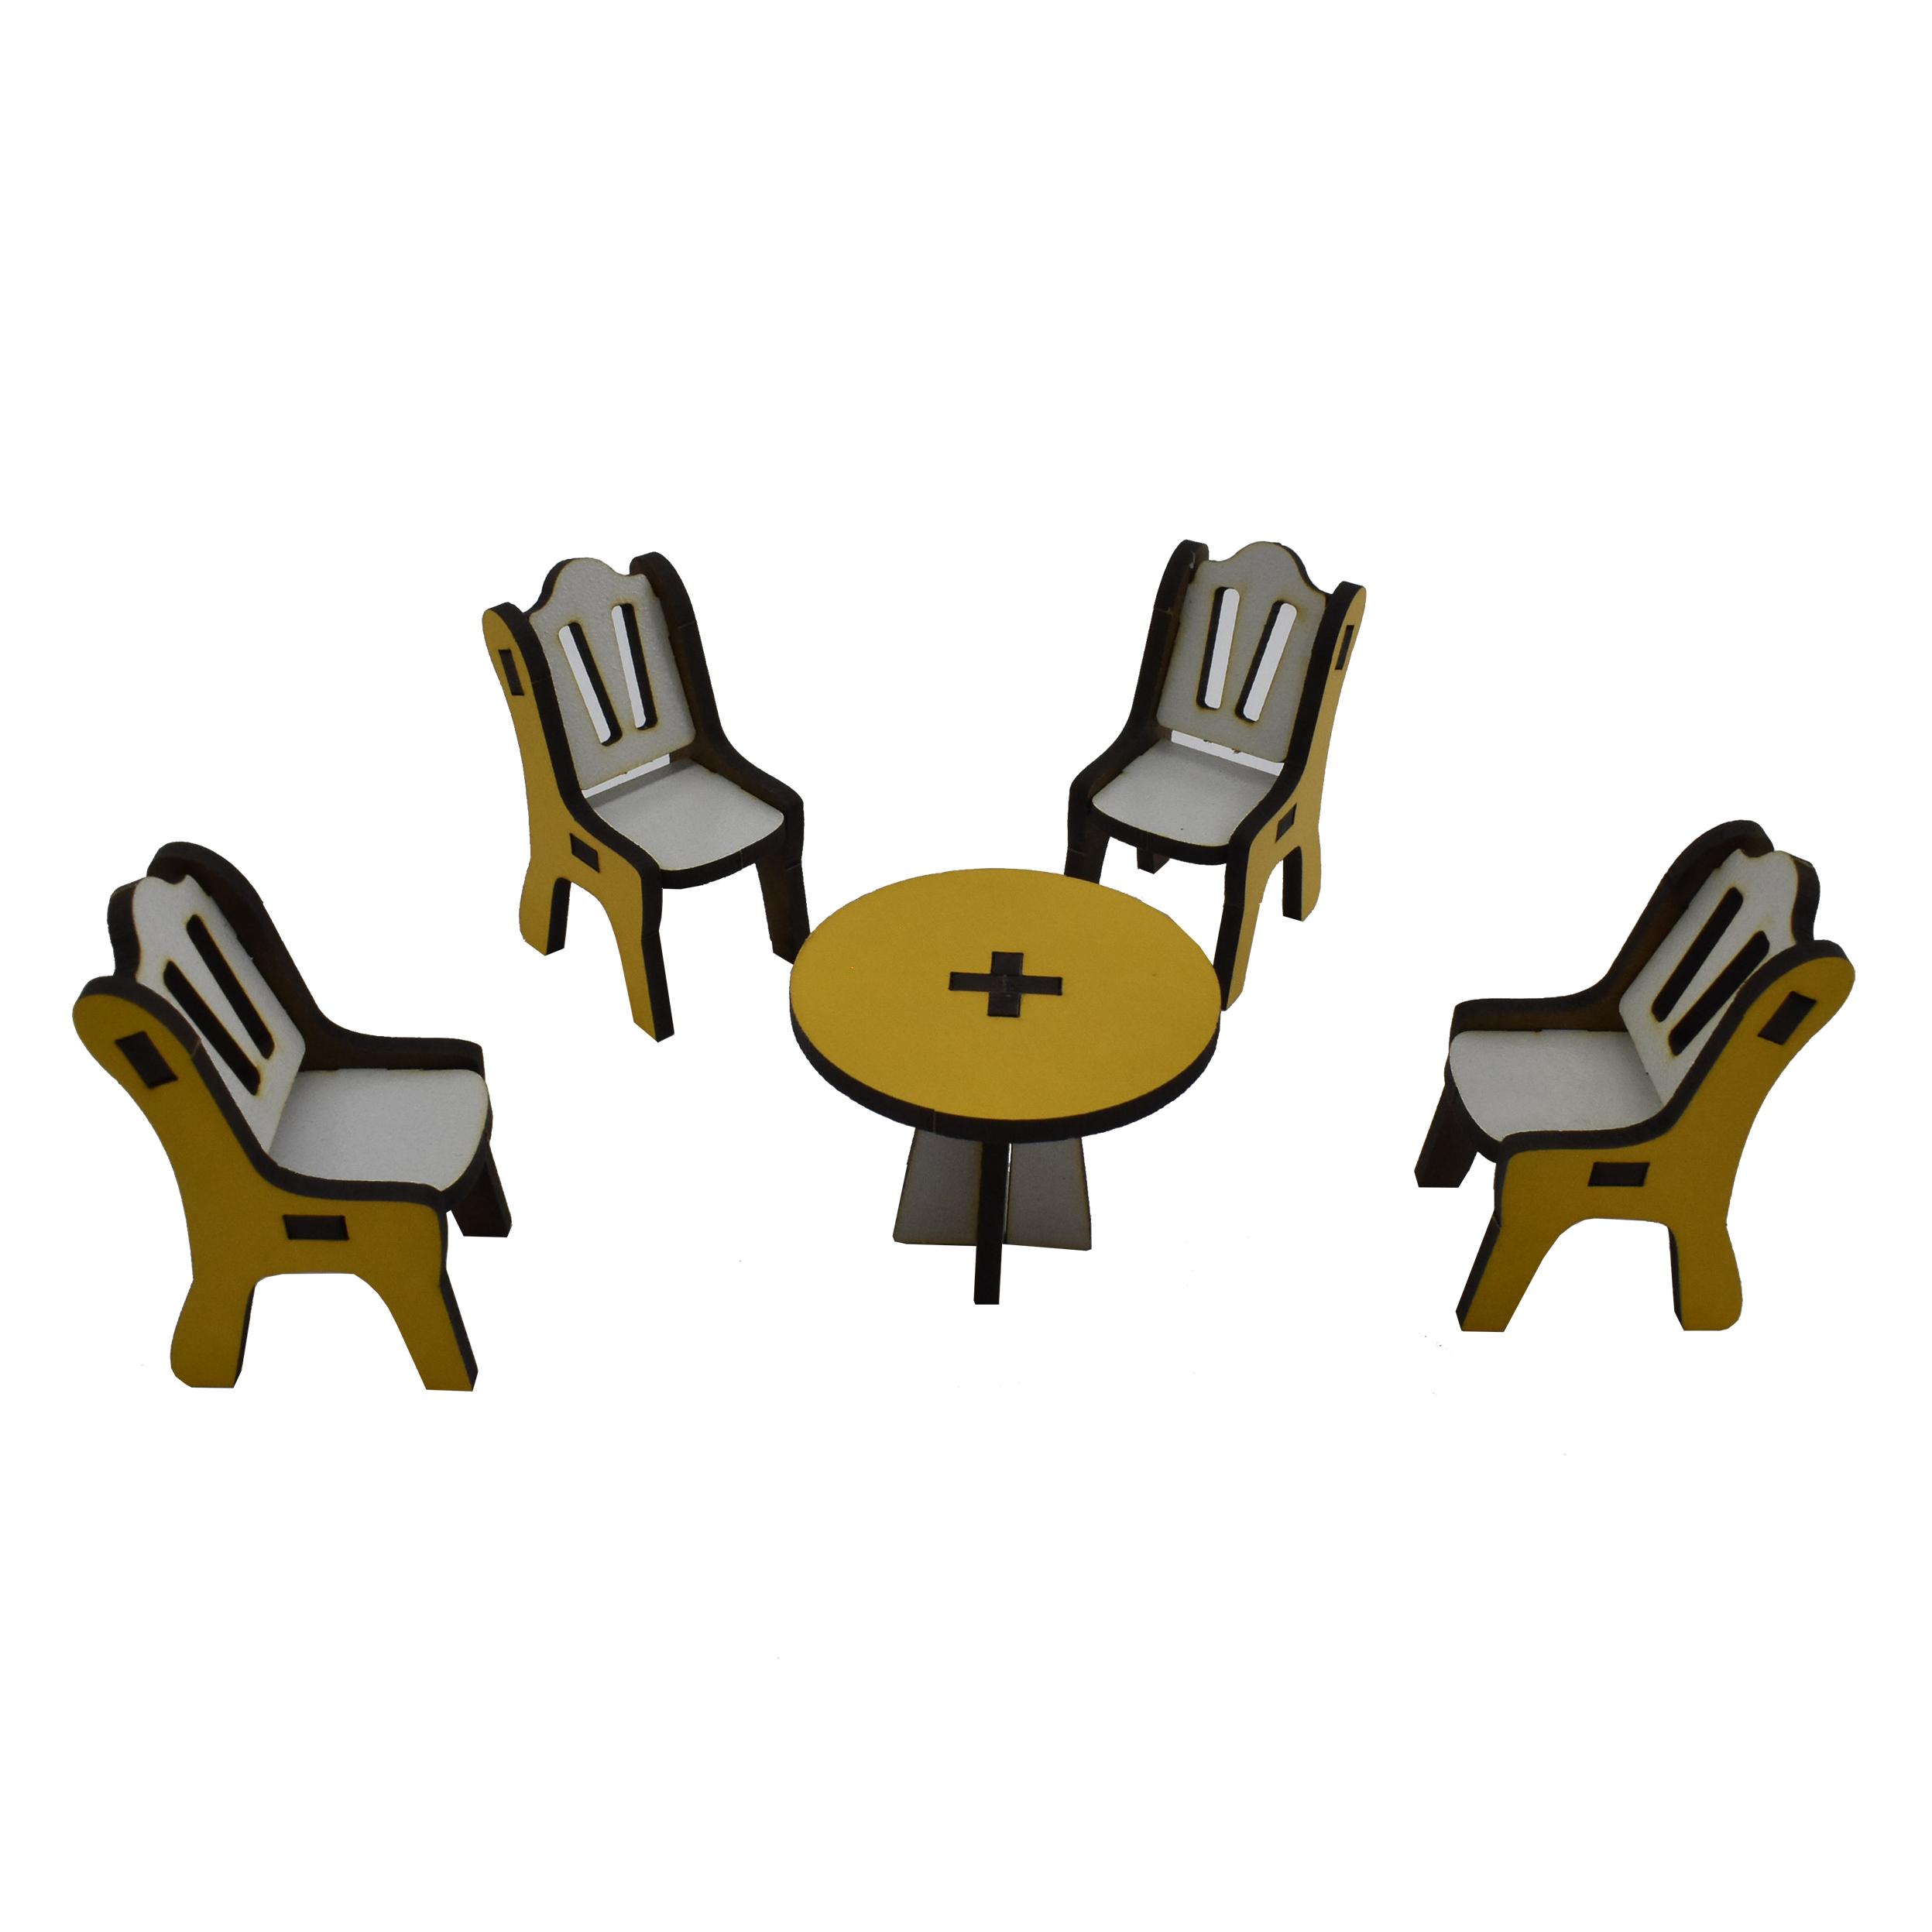 ماکت دکوری طرح میز و صندلی کد01 مجموعه 5 عددی